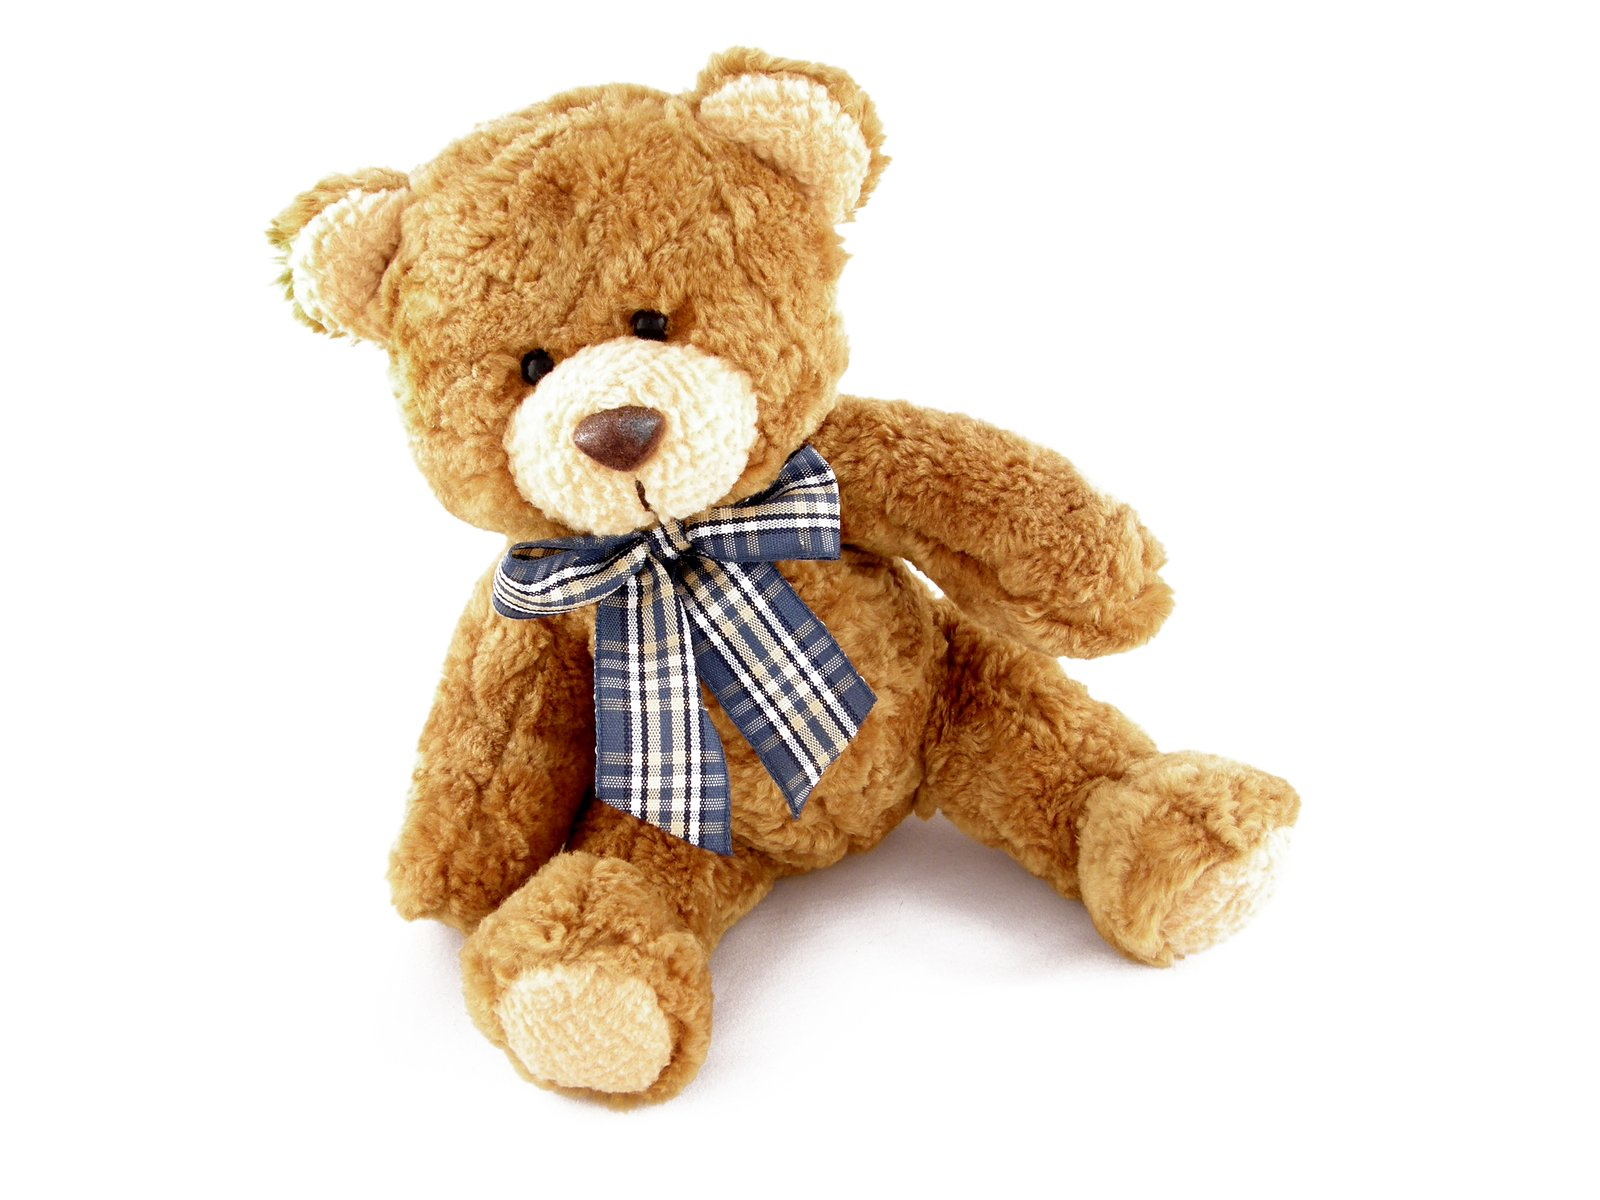 Free My Teddy Bear Stock Photo